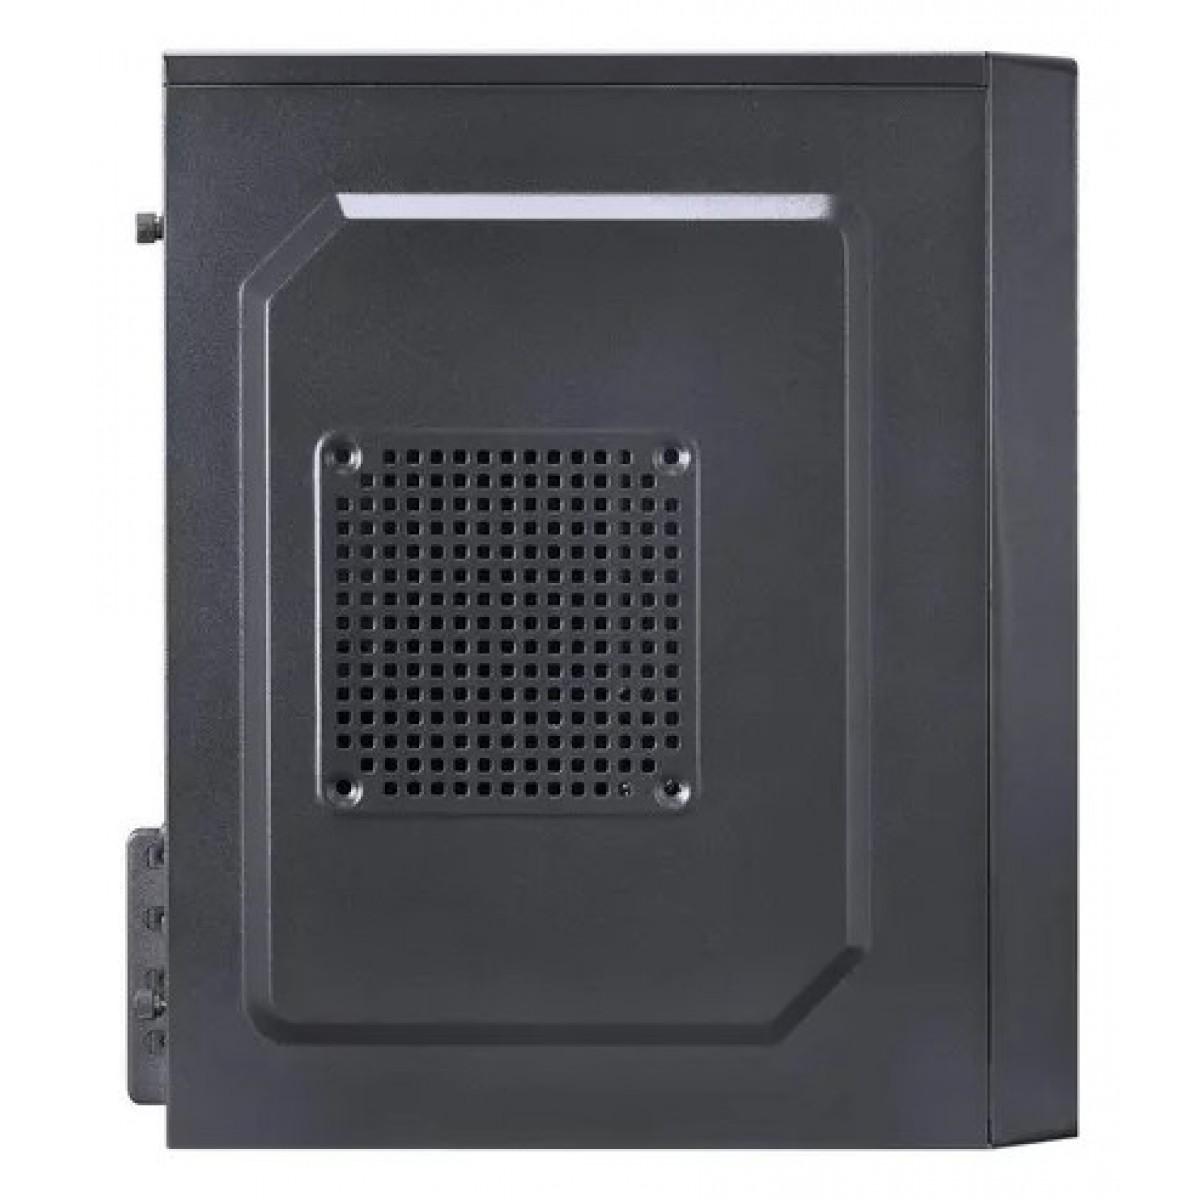 Computador Skul T-Gamer Business B700 i7 4770 / 8GB DDR3 / SSD 120GB  / HDMI/VGA / FONTE 300W